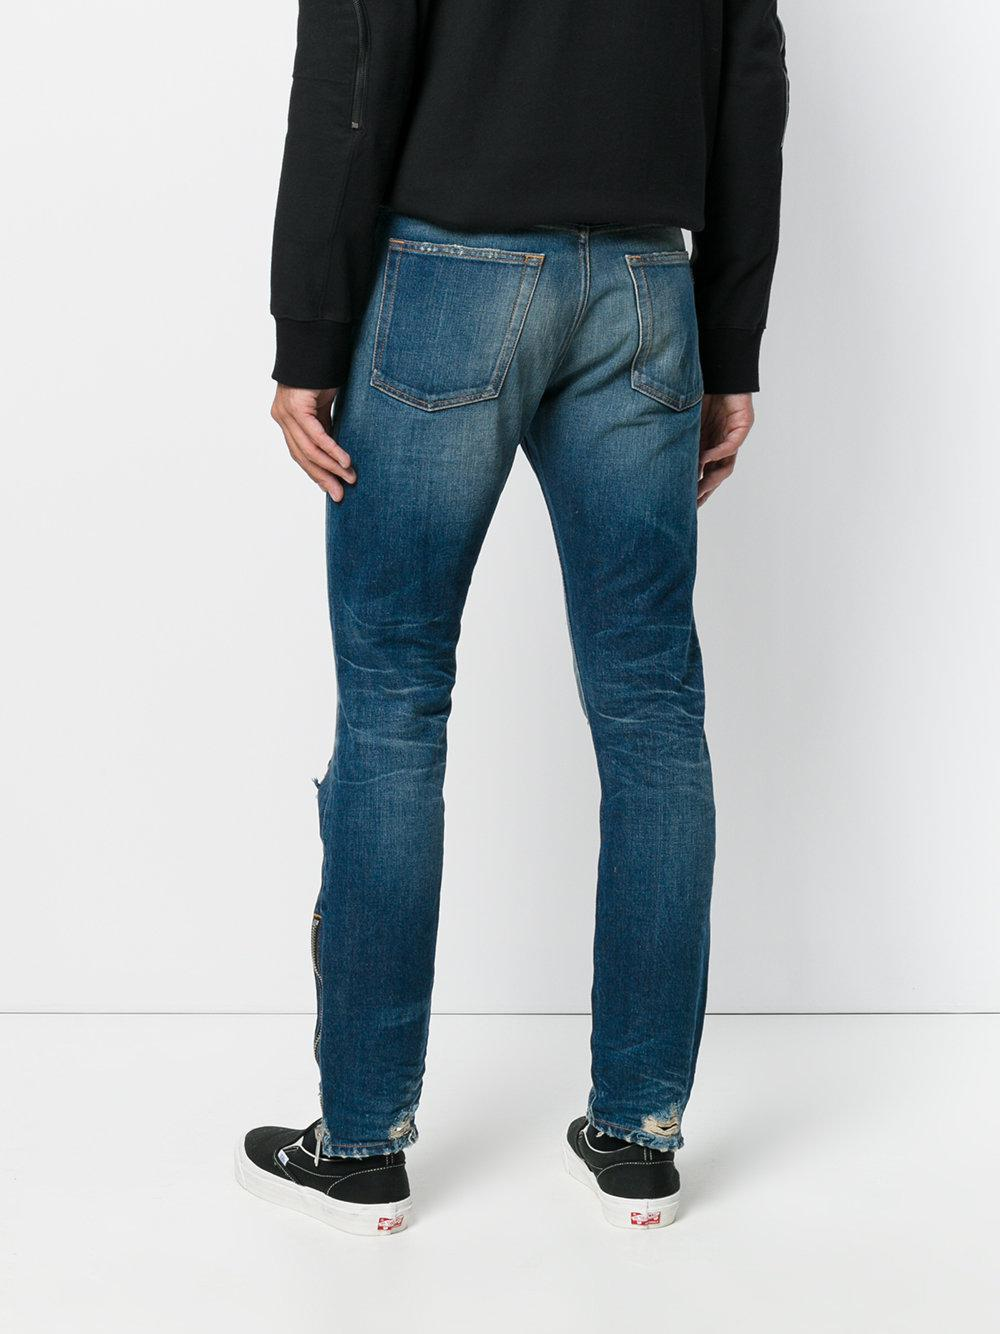 Palm Angels Denim Jeans Skinny Effetto Invecchiato in Blue for Men